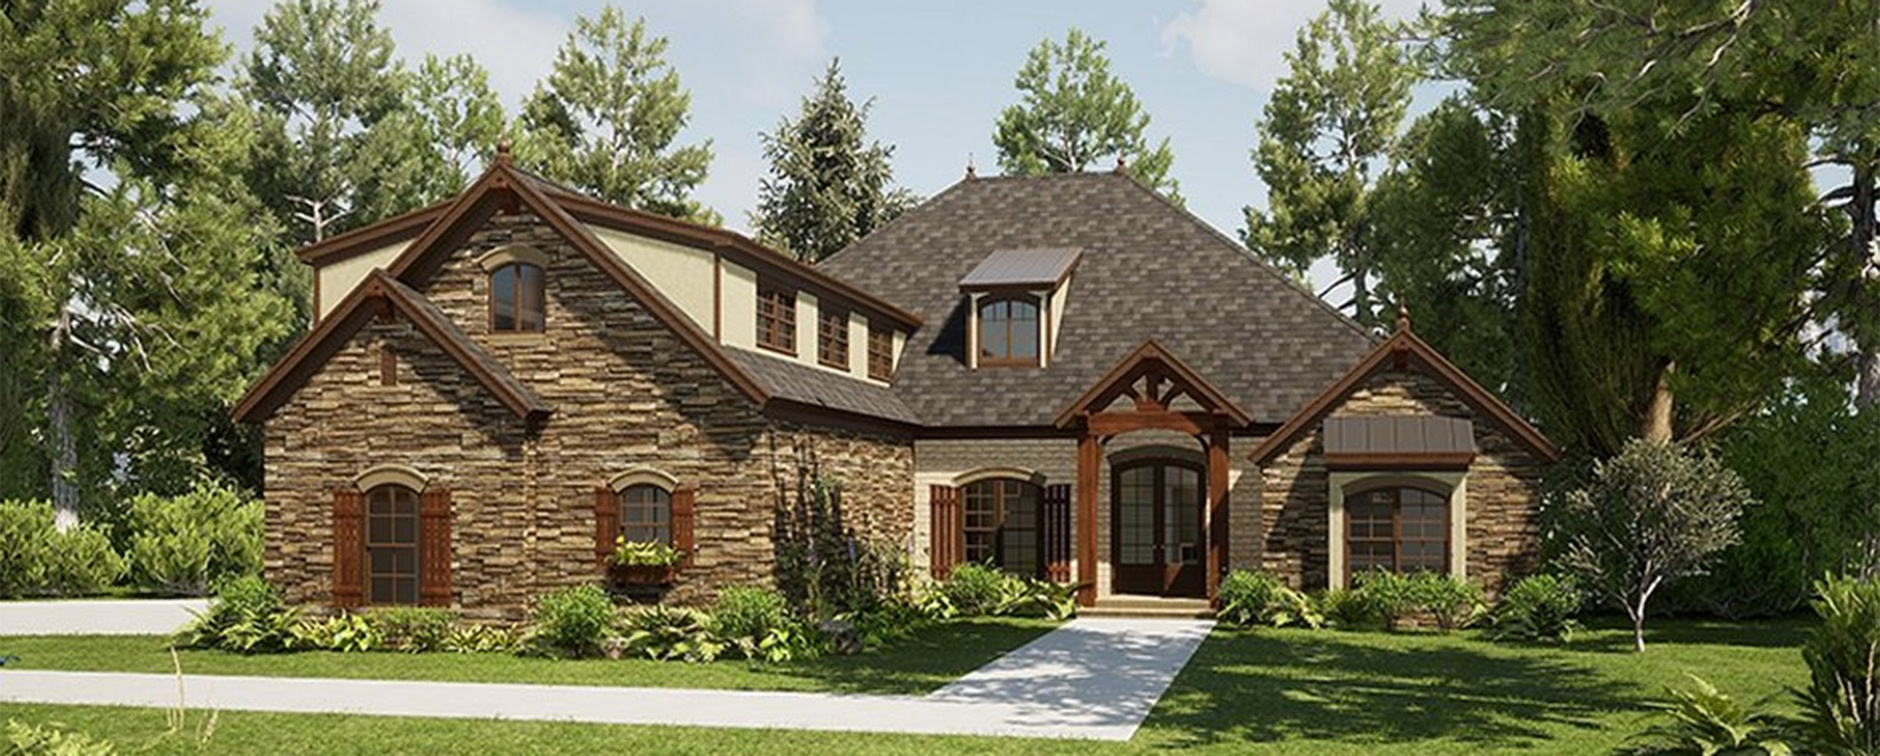 New Craftsman House Plan 923-168